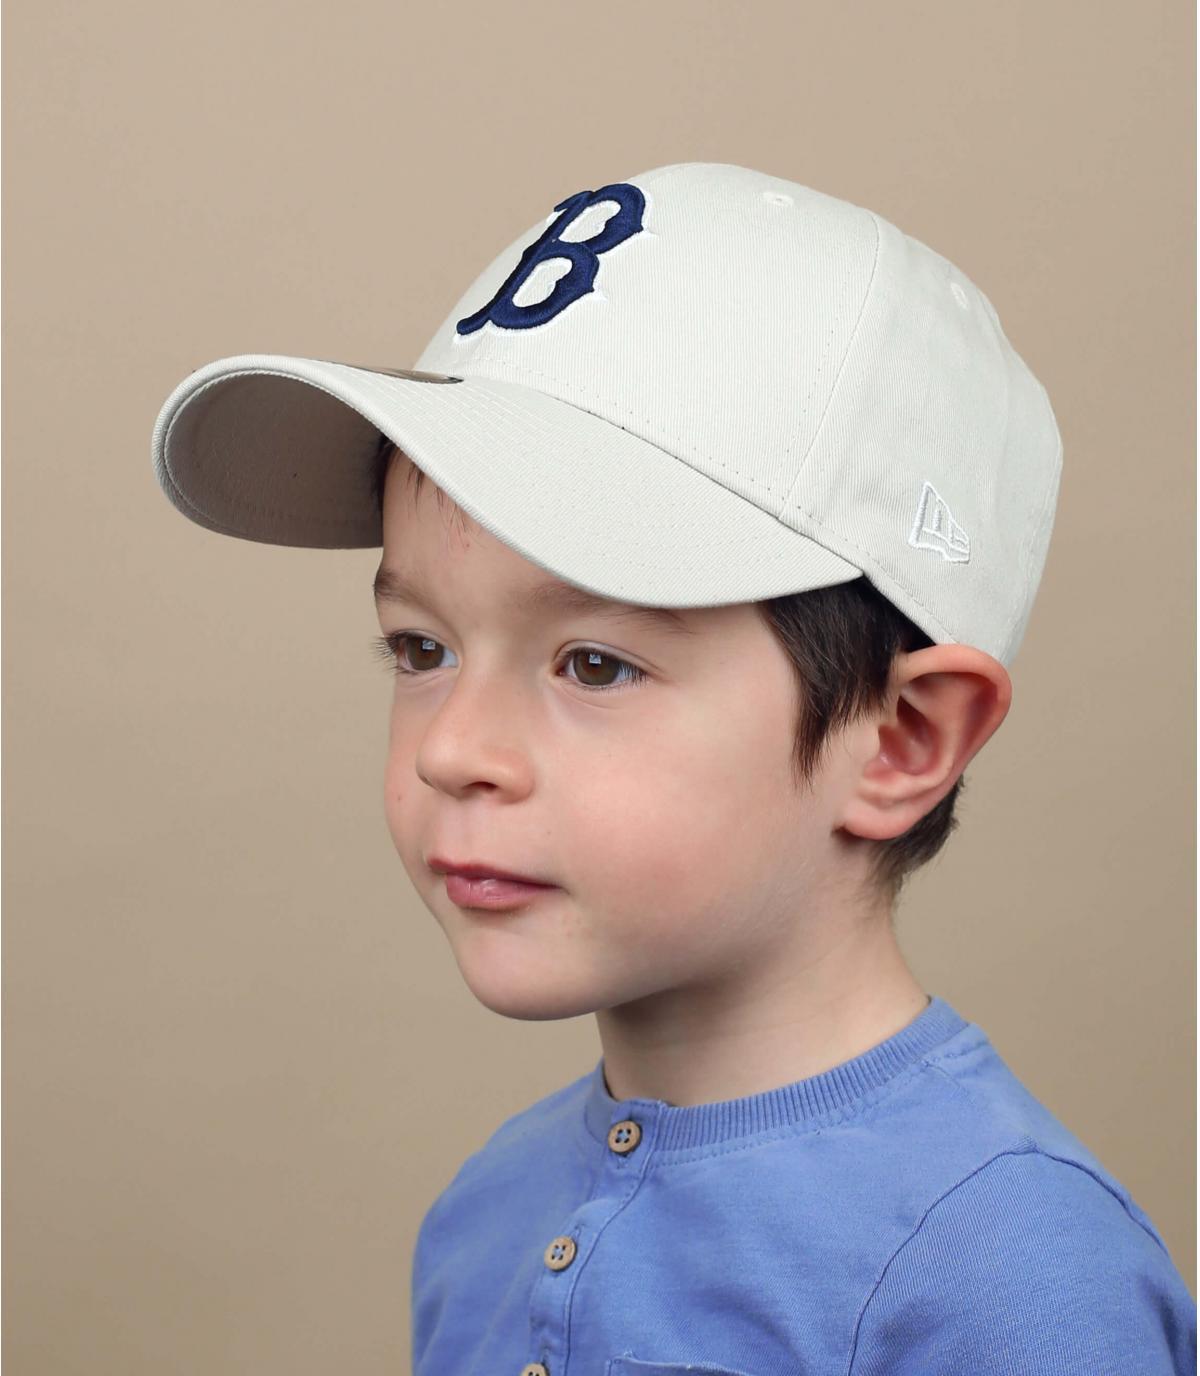 gorra niño B beis